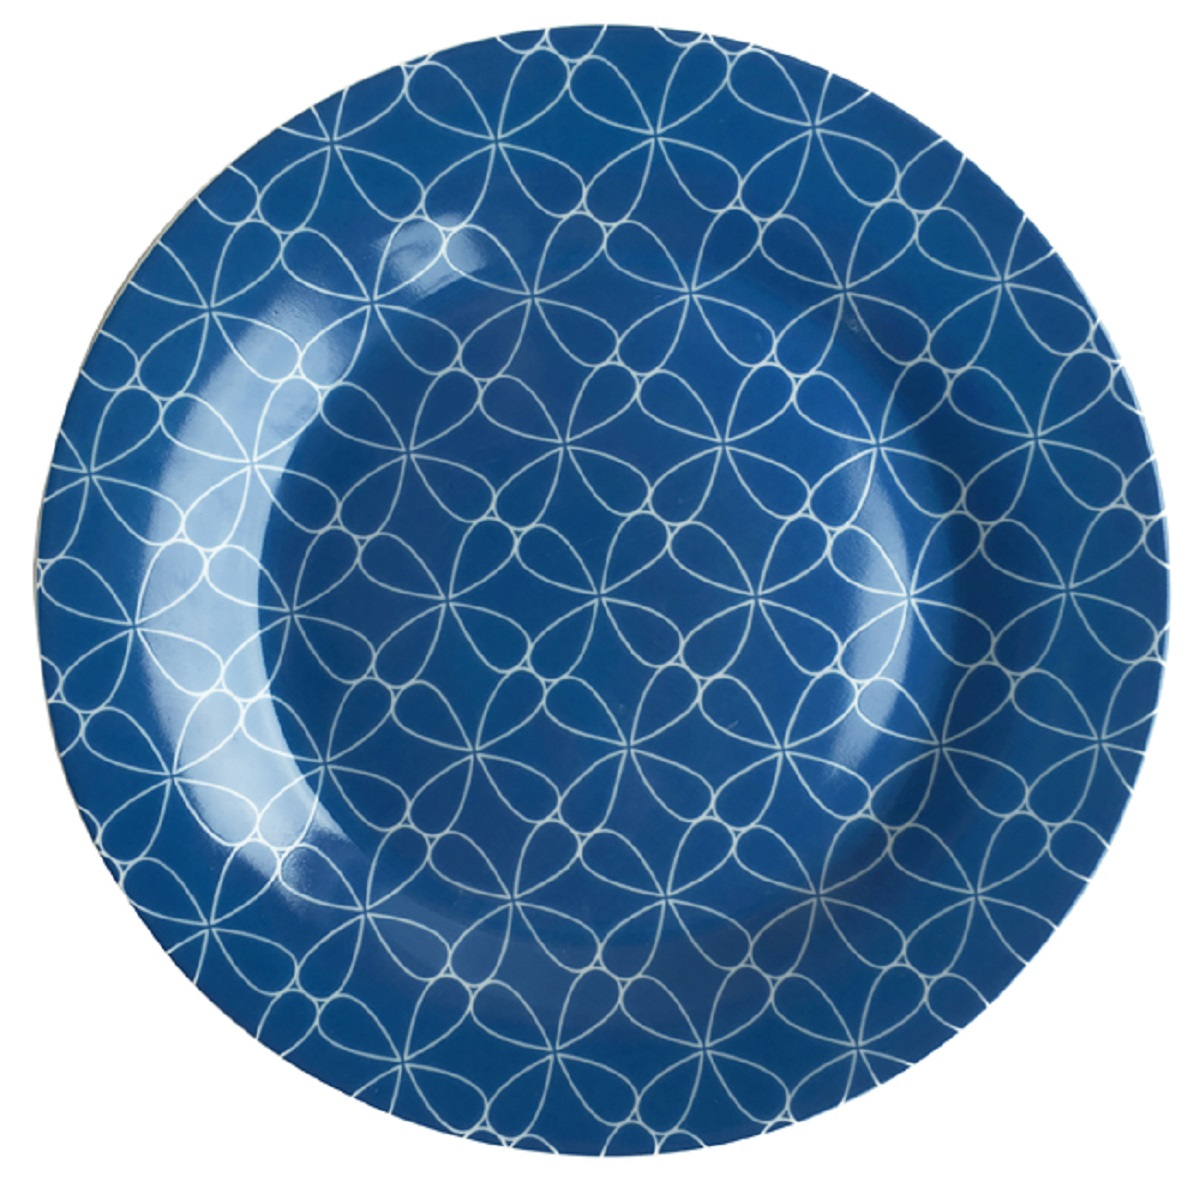 Тарелка десертная МФК-профит Белла, диаметр 18 см